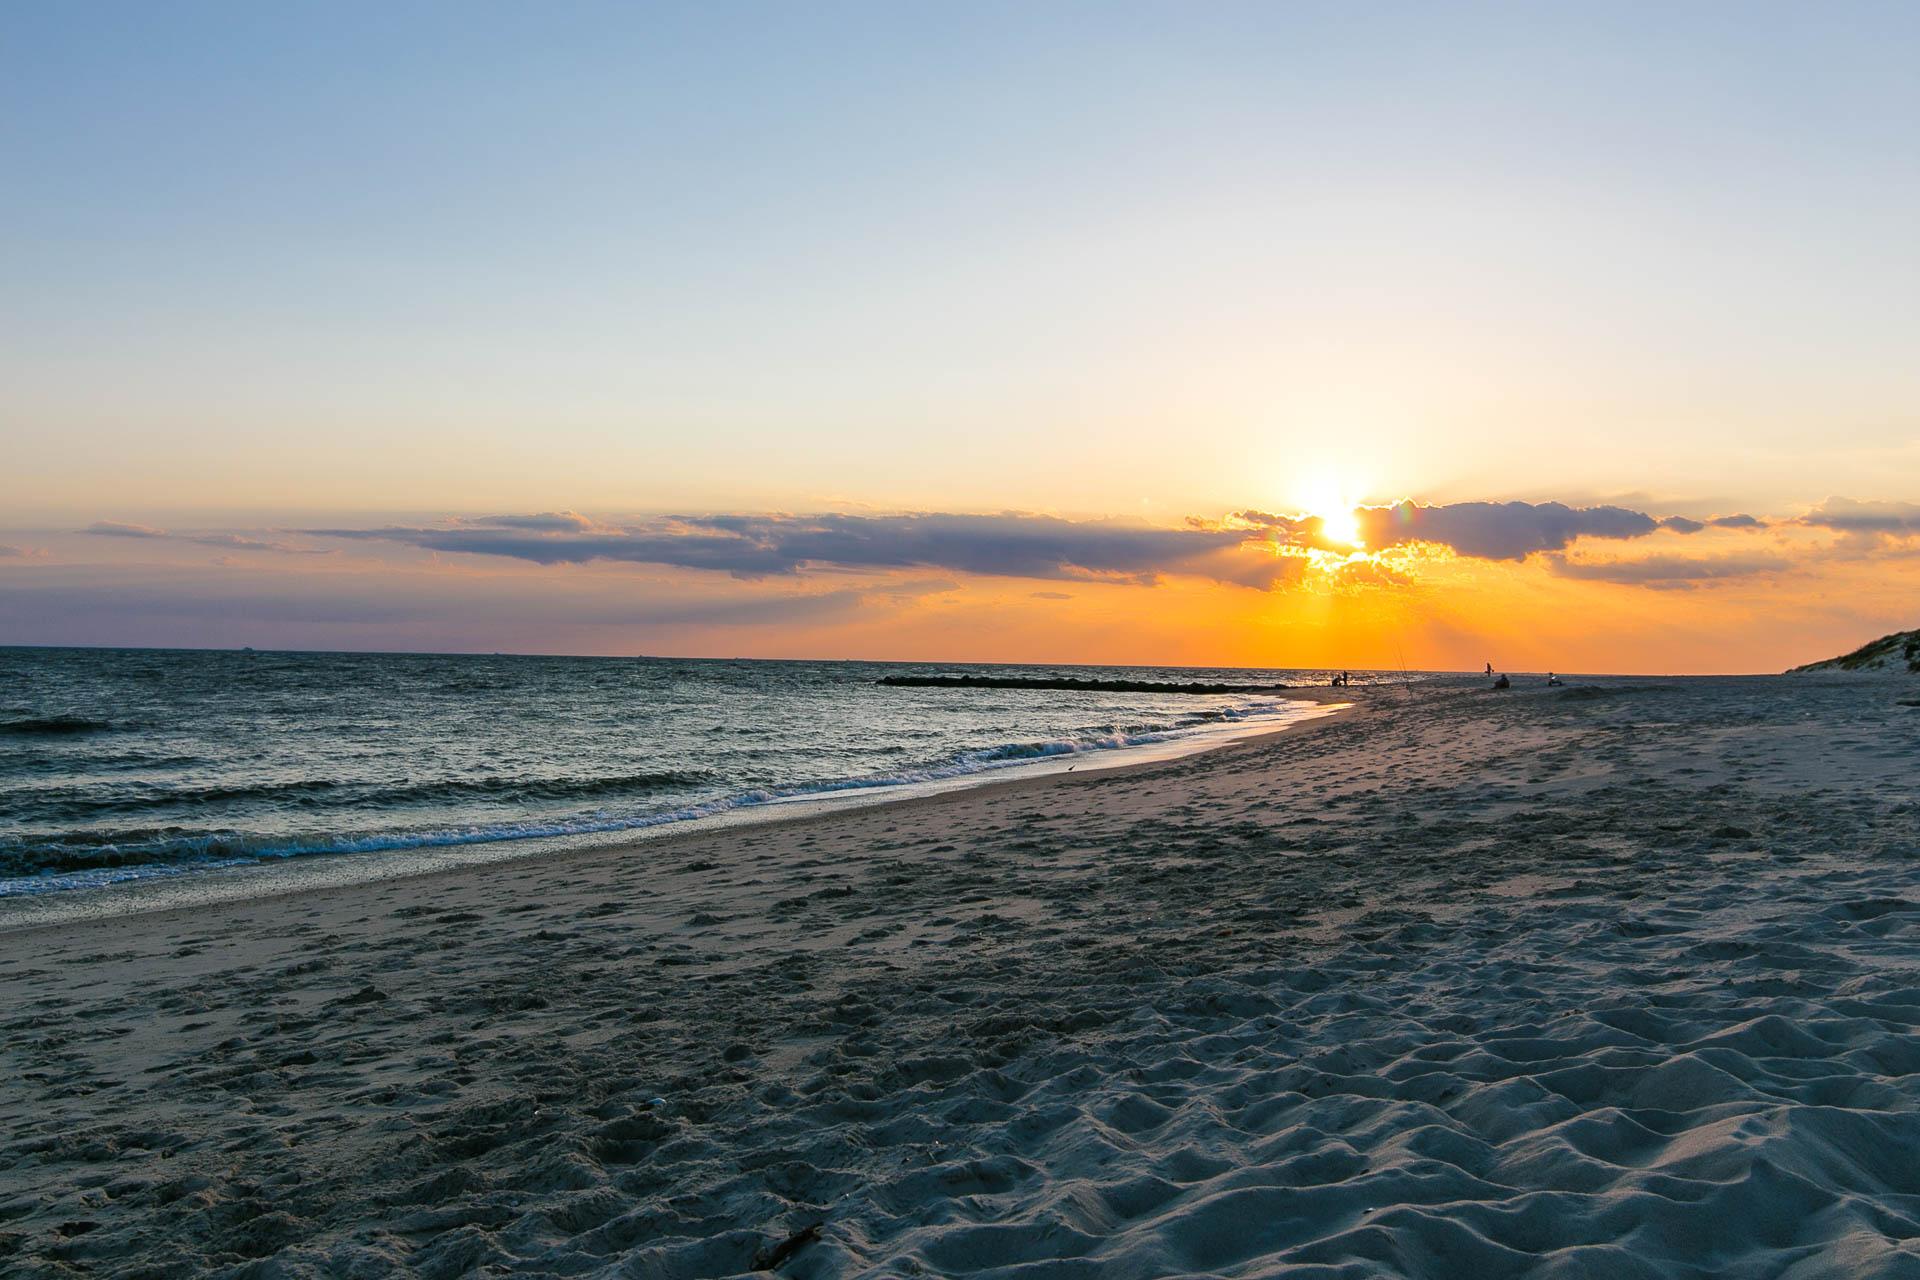 Sunset at Cape May